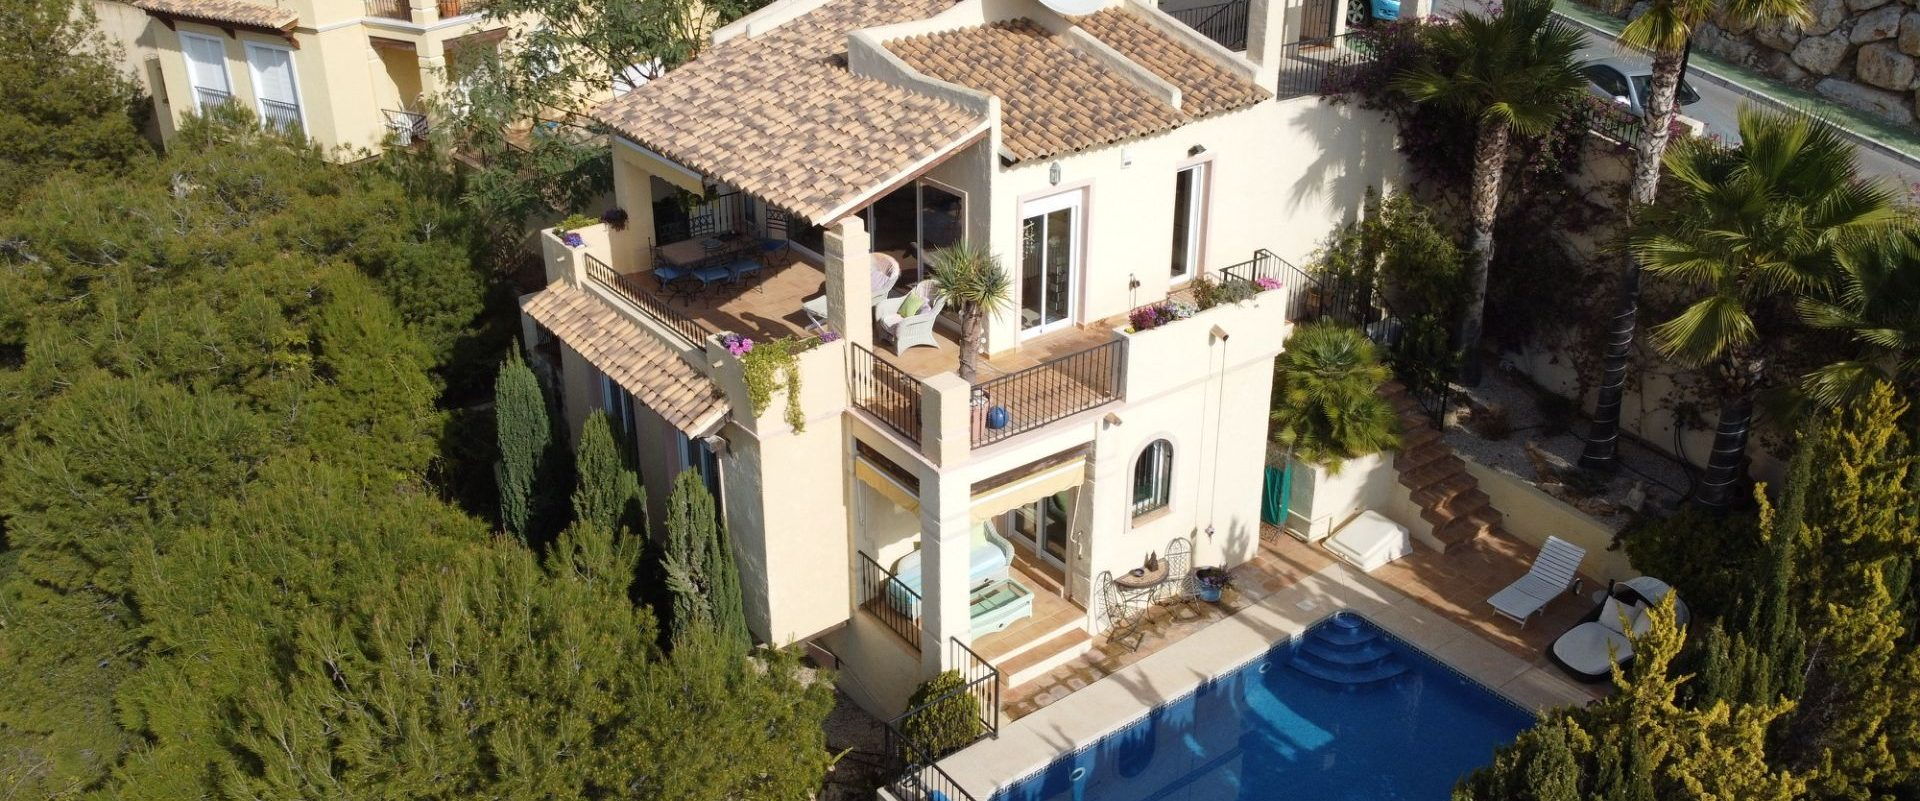 Villa mit Meerblick und Pool in Altea Hills